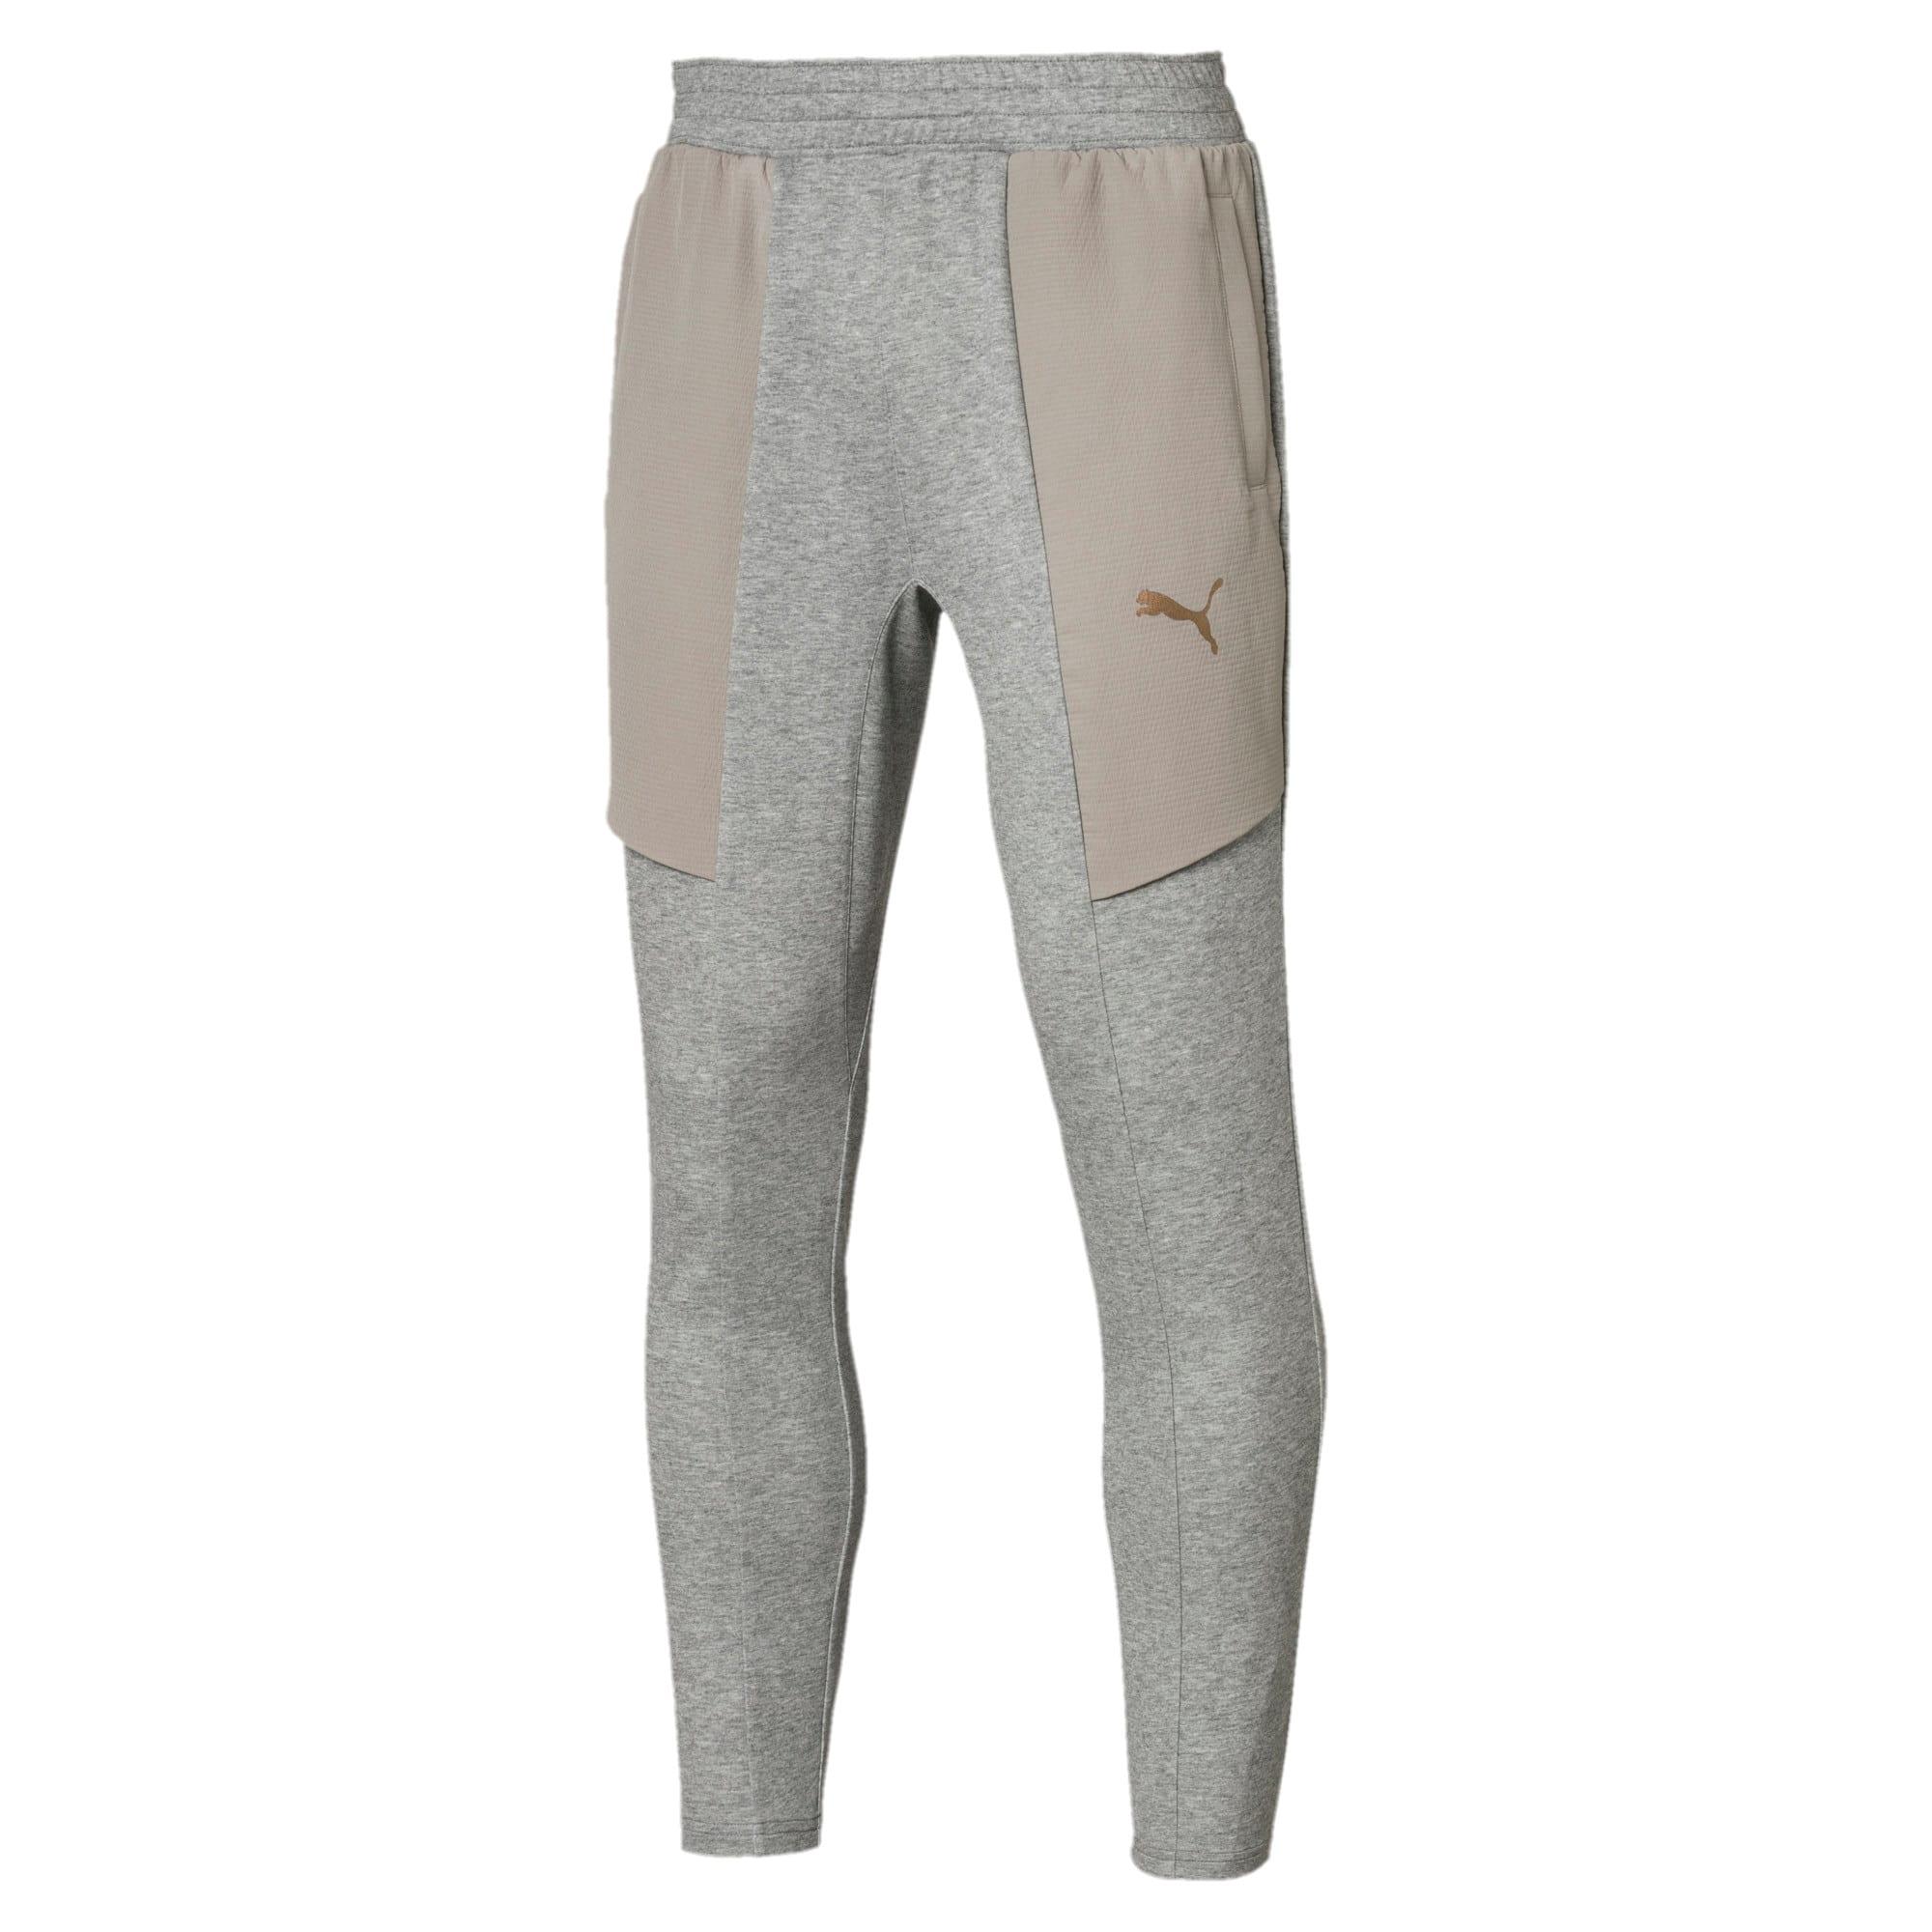 Thumbnail 1 of Energy Desert Tapered Men's Training Pants, Medium Gray Heather, medium